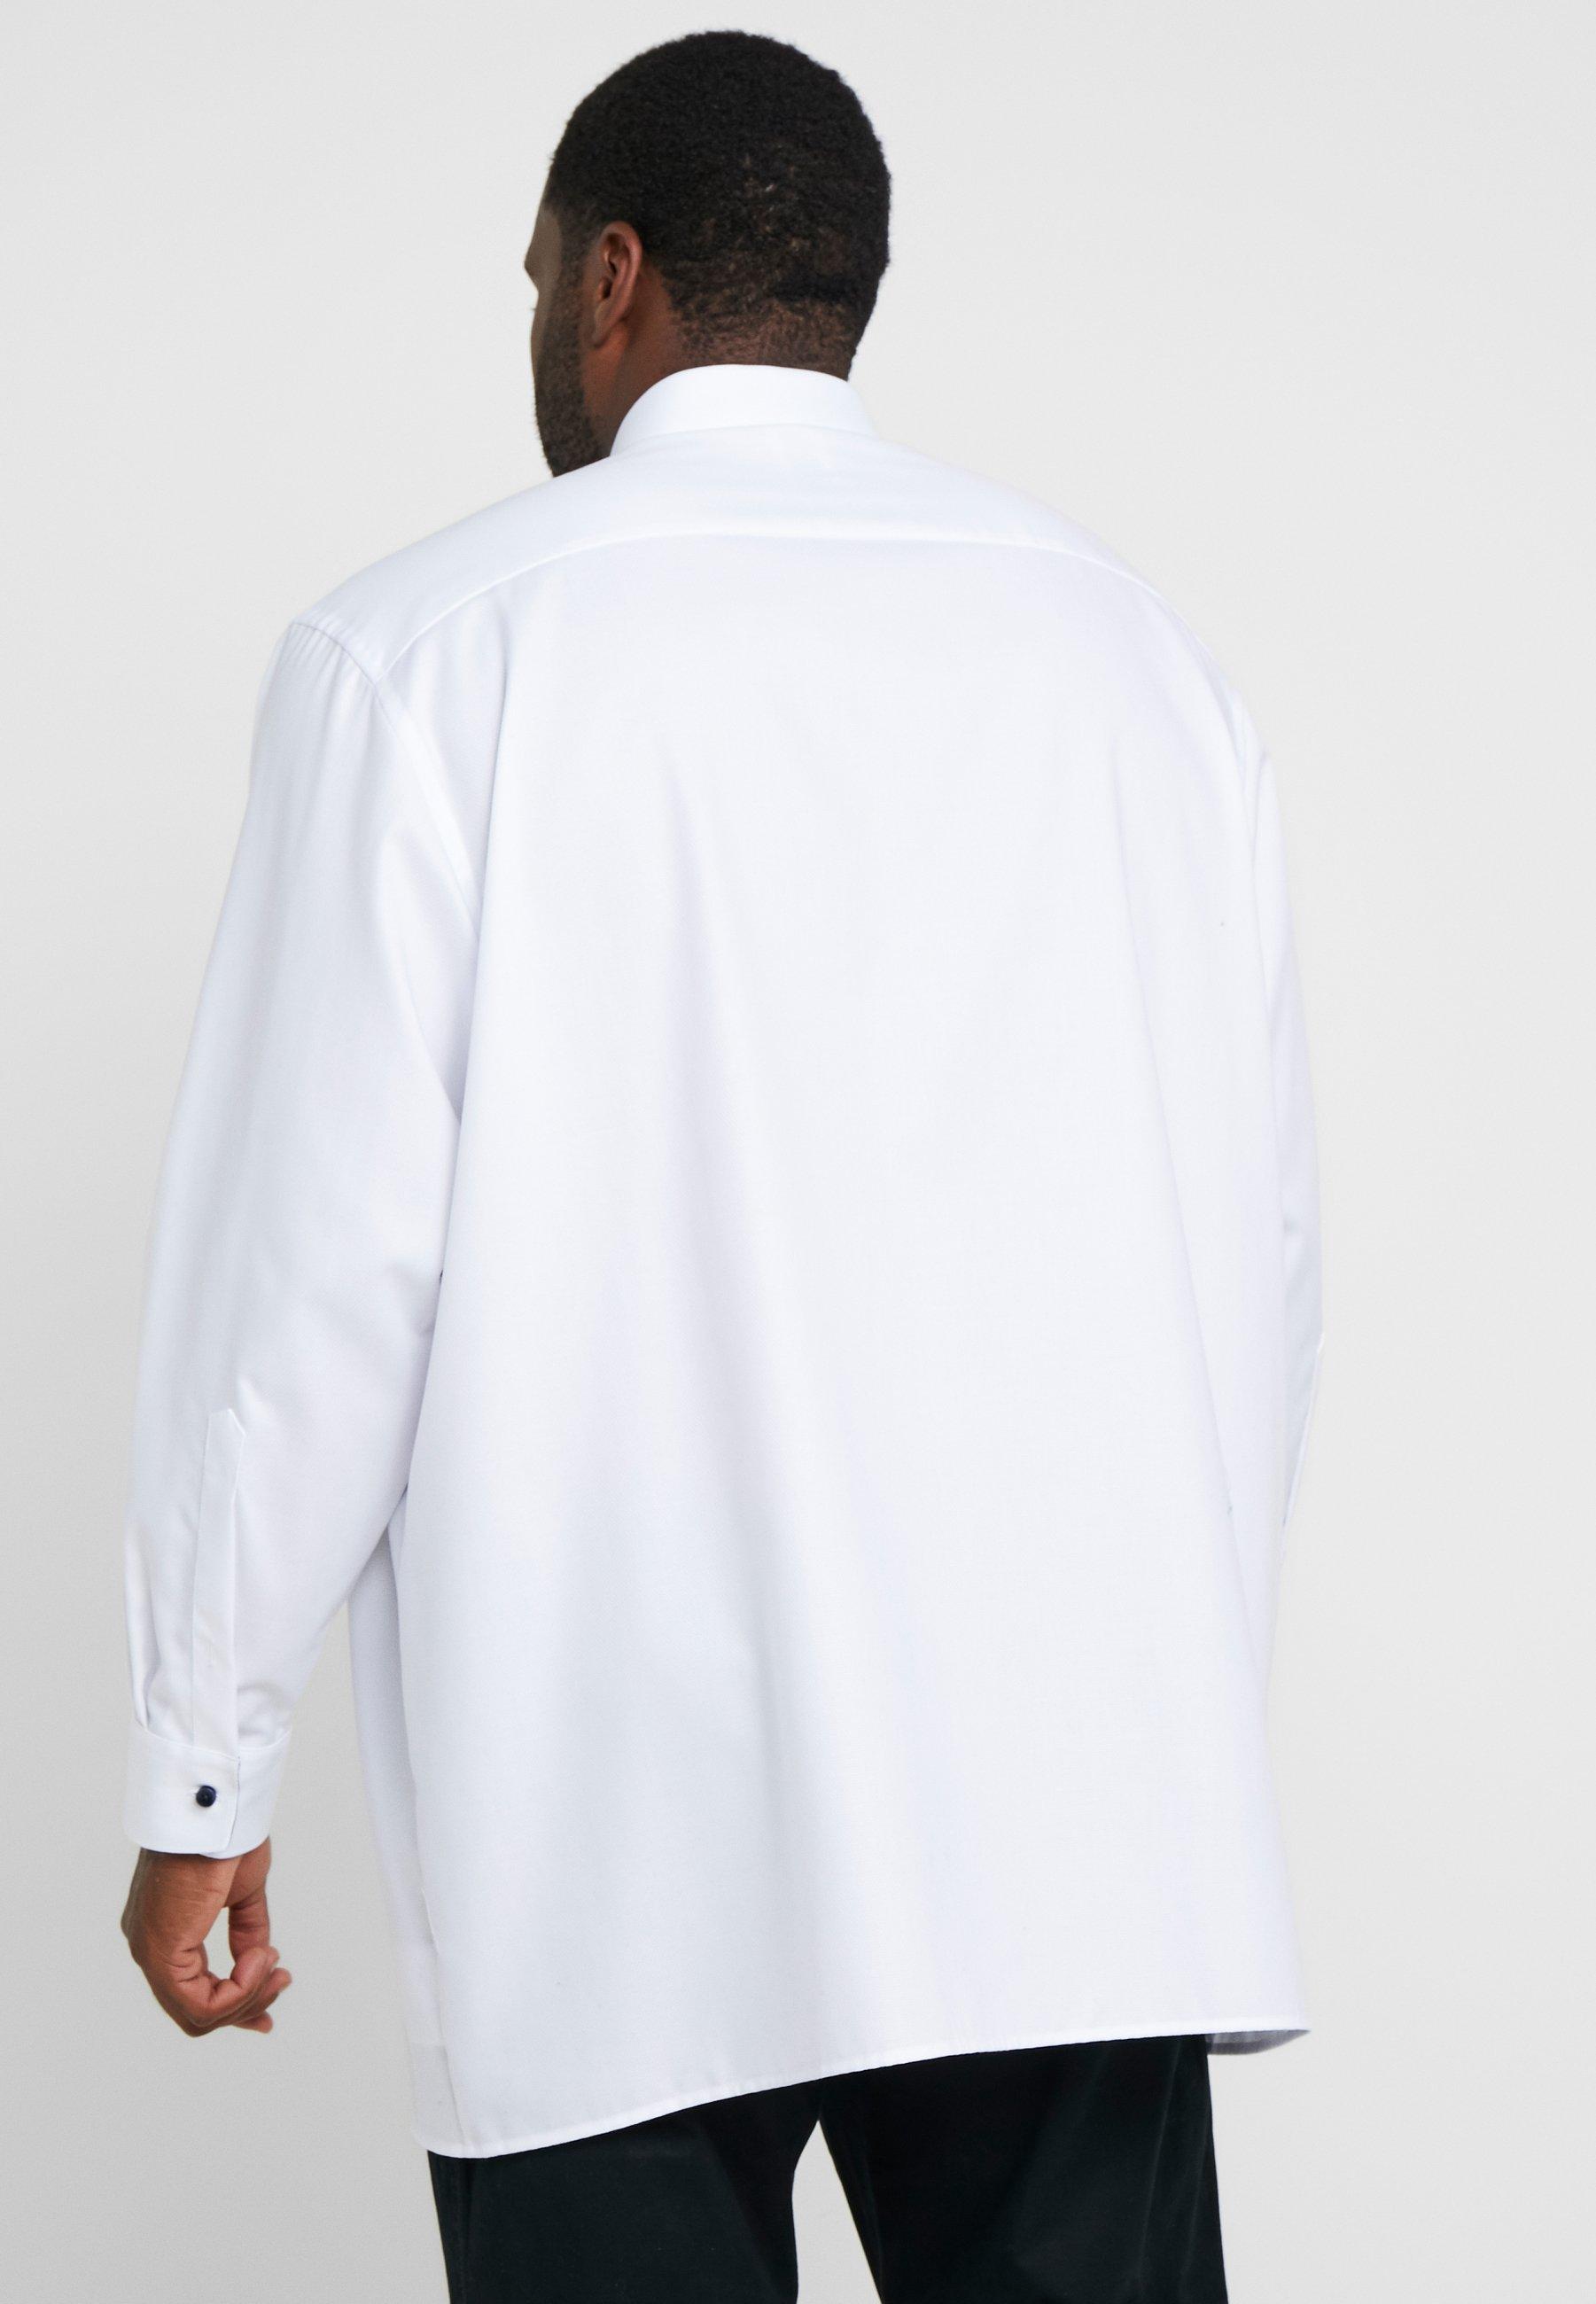 Weiß Classique FitChemise Comfort Olymp Luxor kOXuPZi